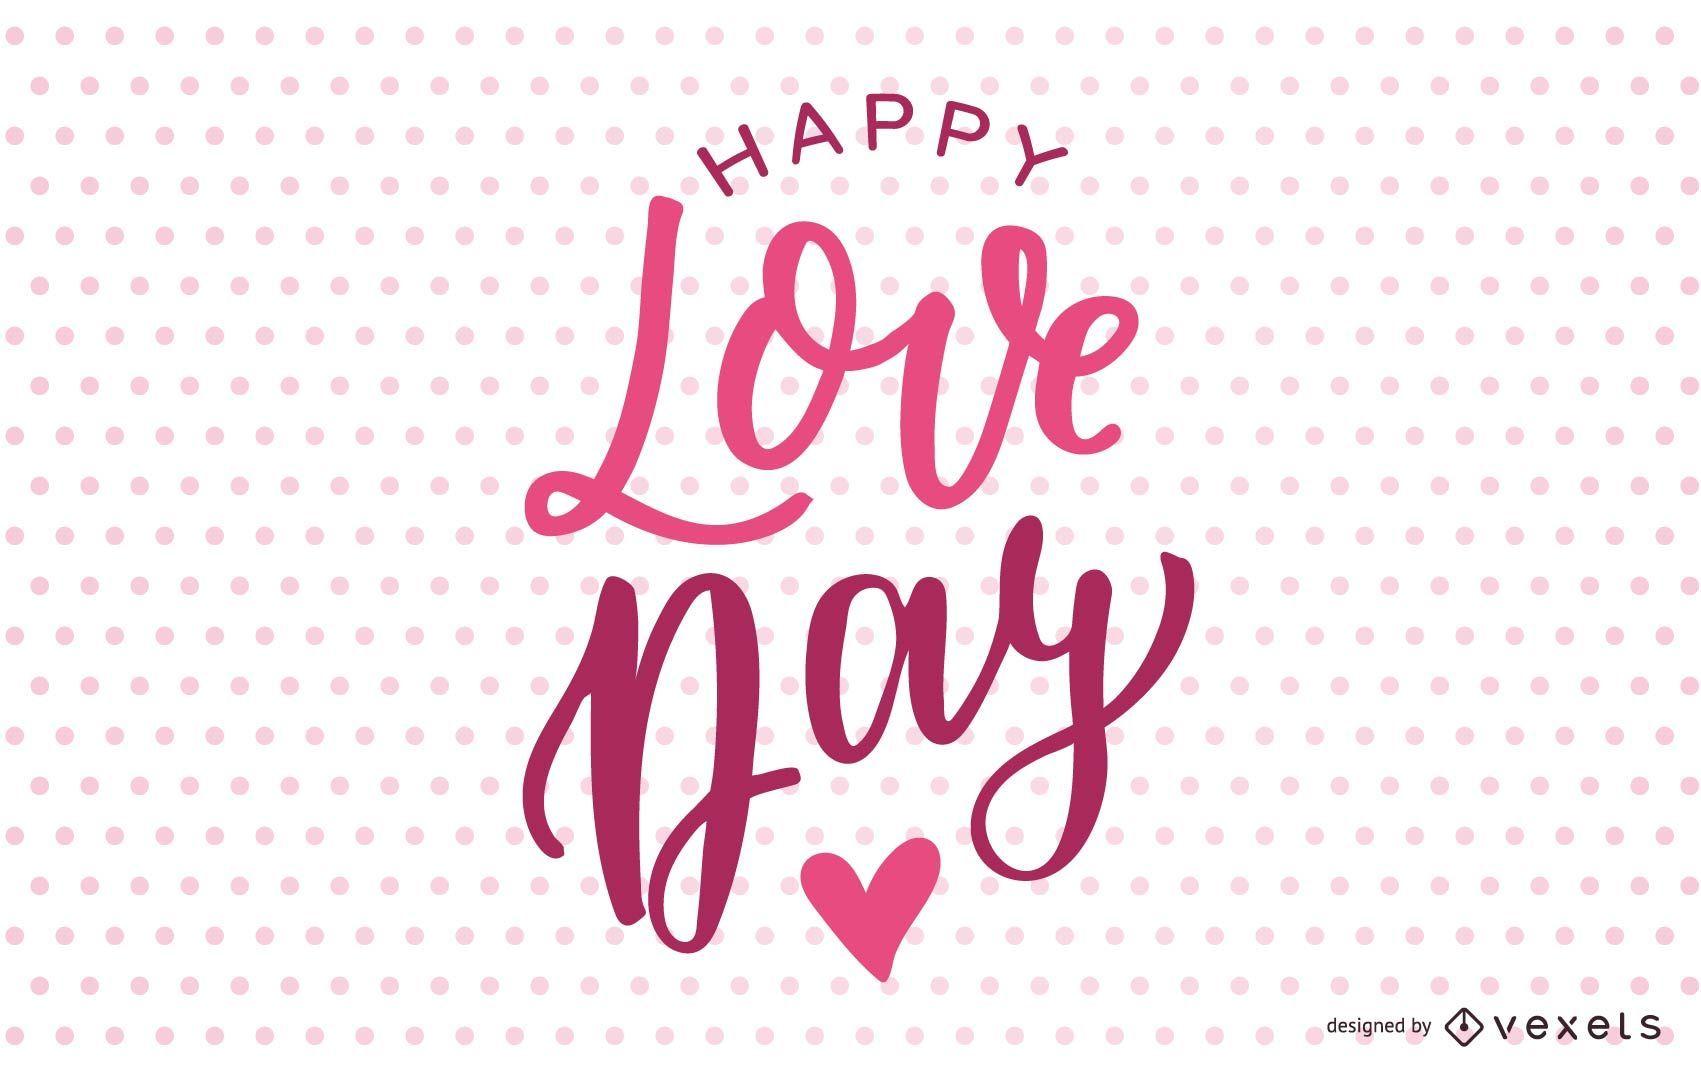 Happy Love Day Lettering Design